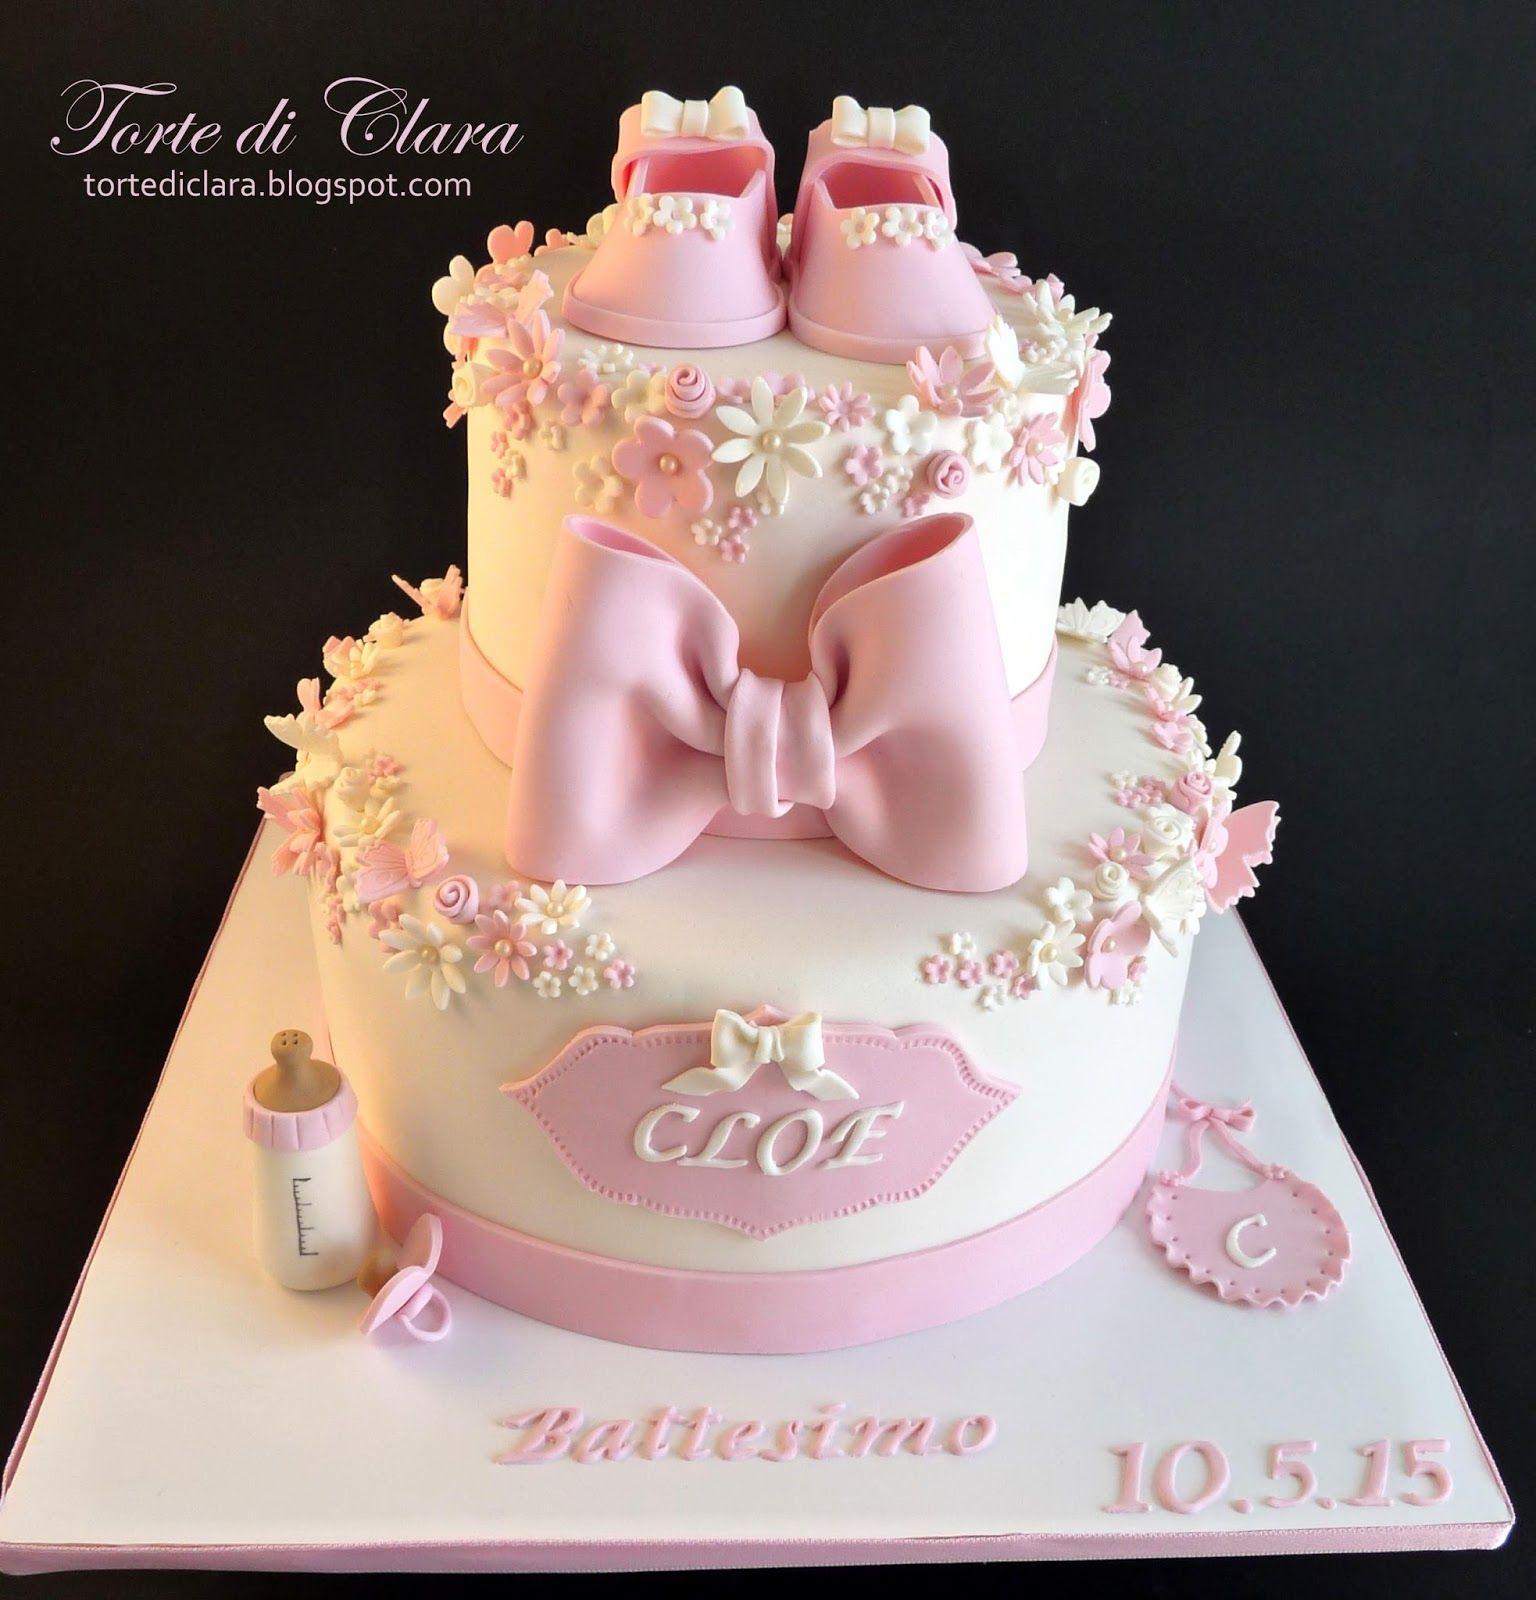 Bien-aimé torta battesimo - Cerca con Google | bimbi | Pinterest  ER96